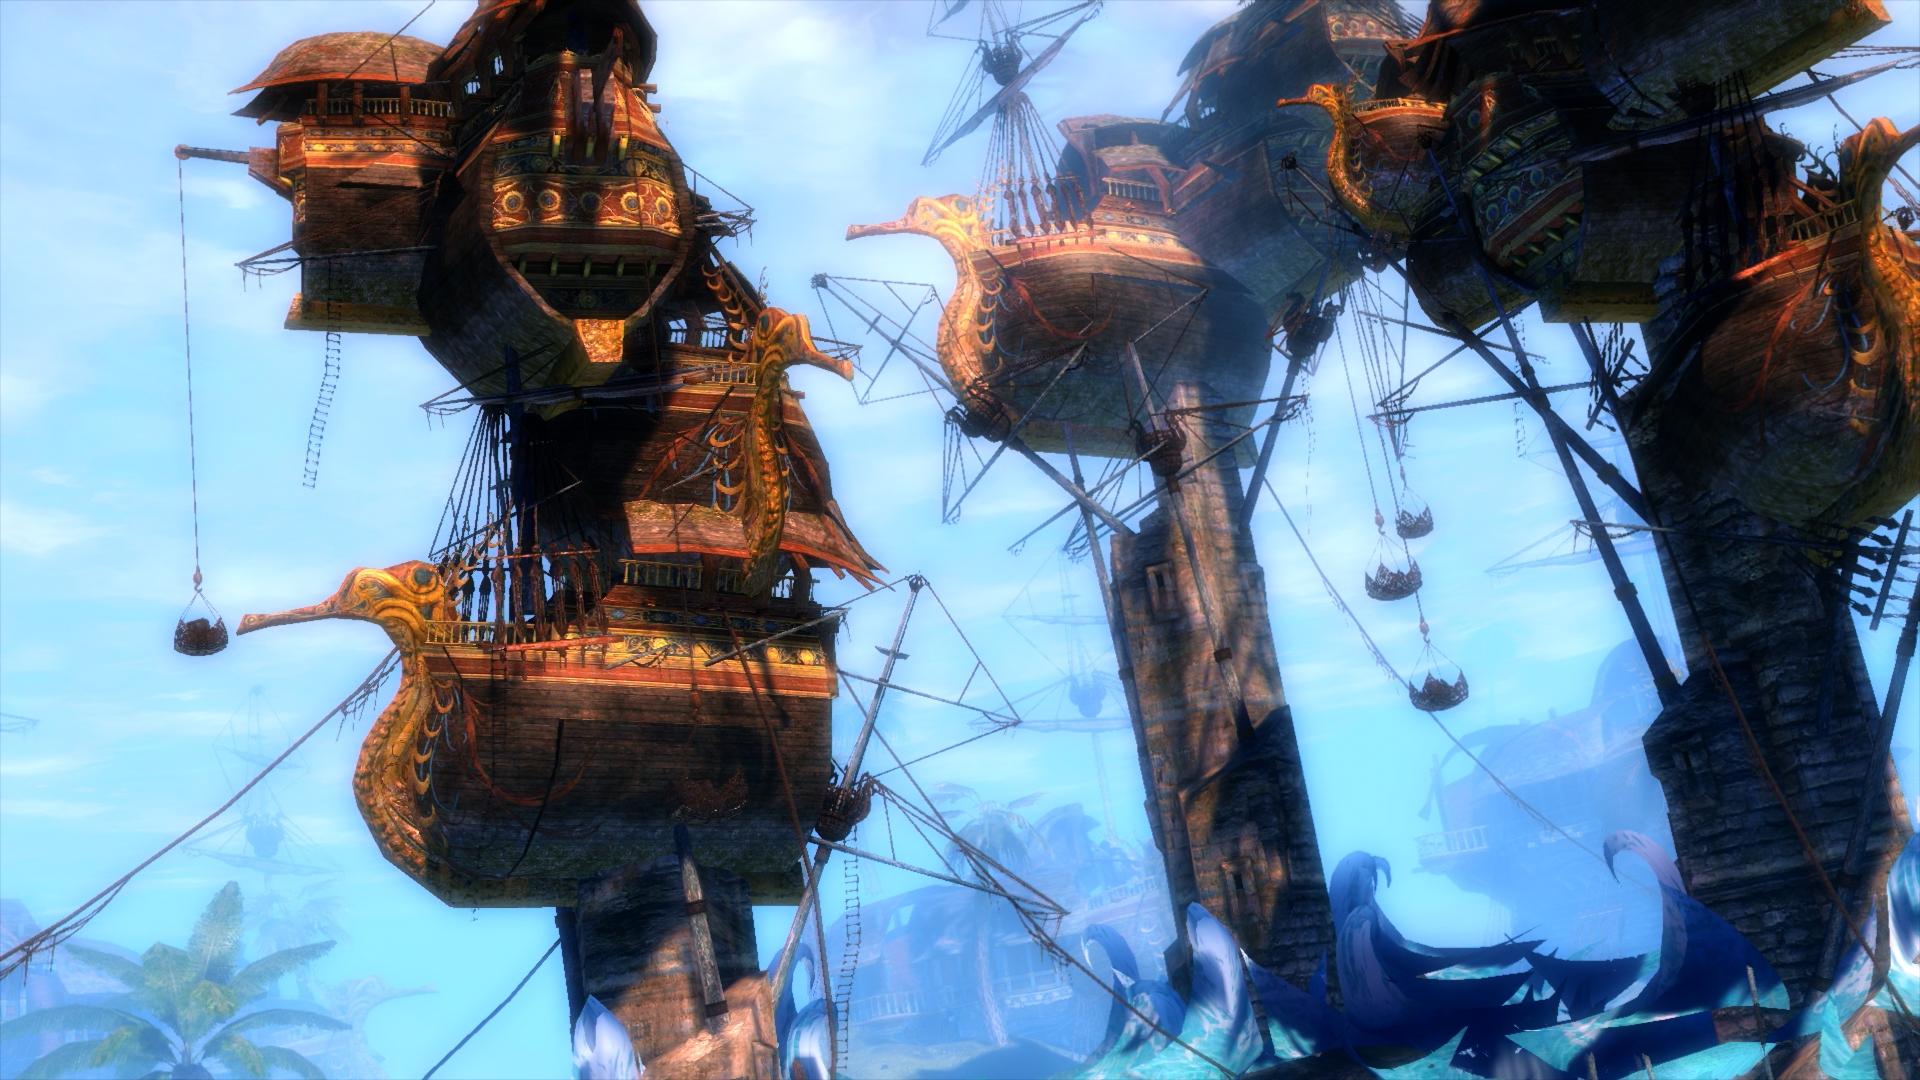 Guild Wars 2 Key (Digital Deluxe Edition) Screenshot 3. Guild Wars 2